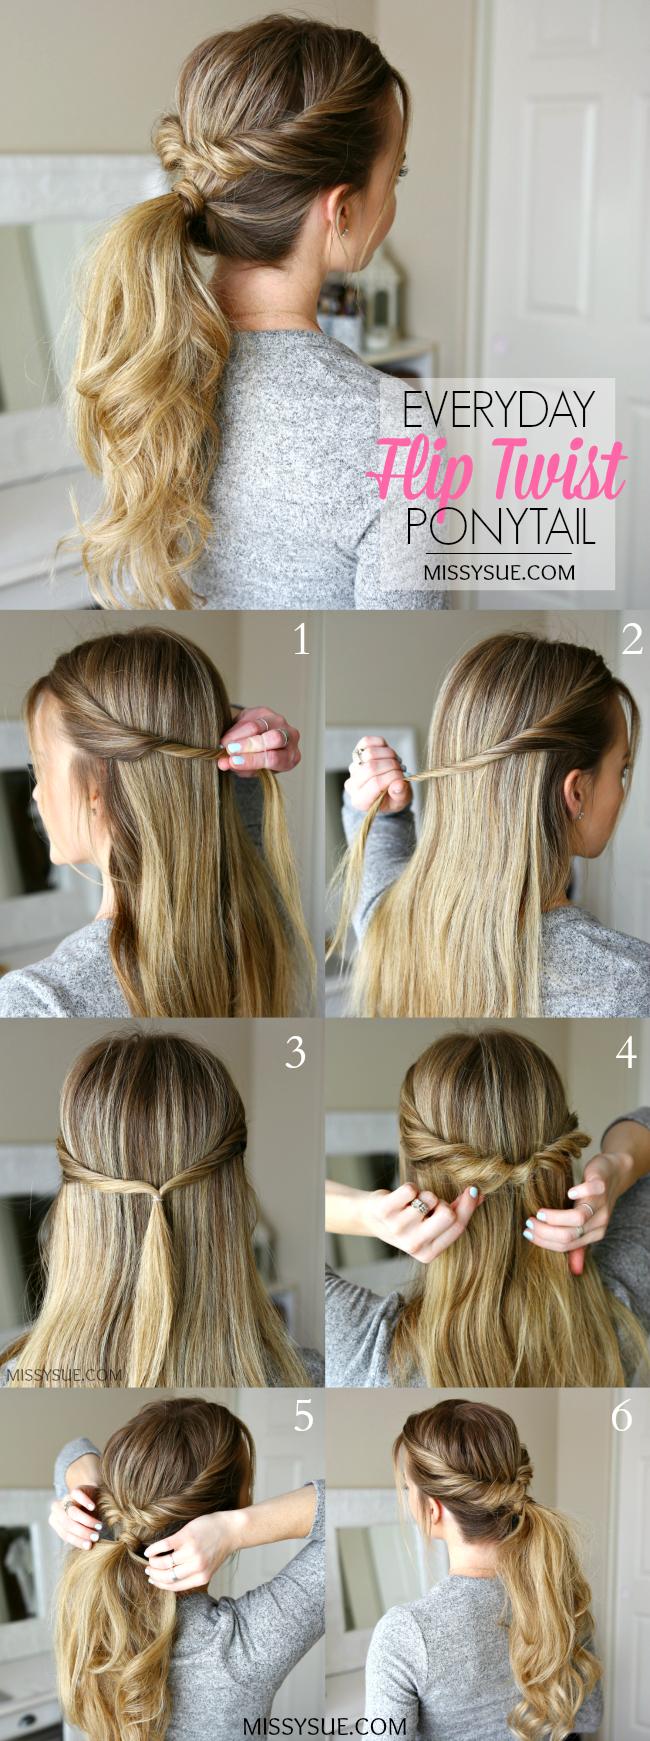 Hairstyles For Church Easy | Fade Haircut